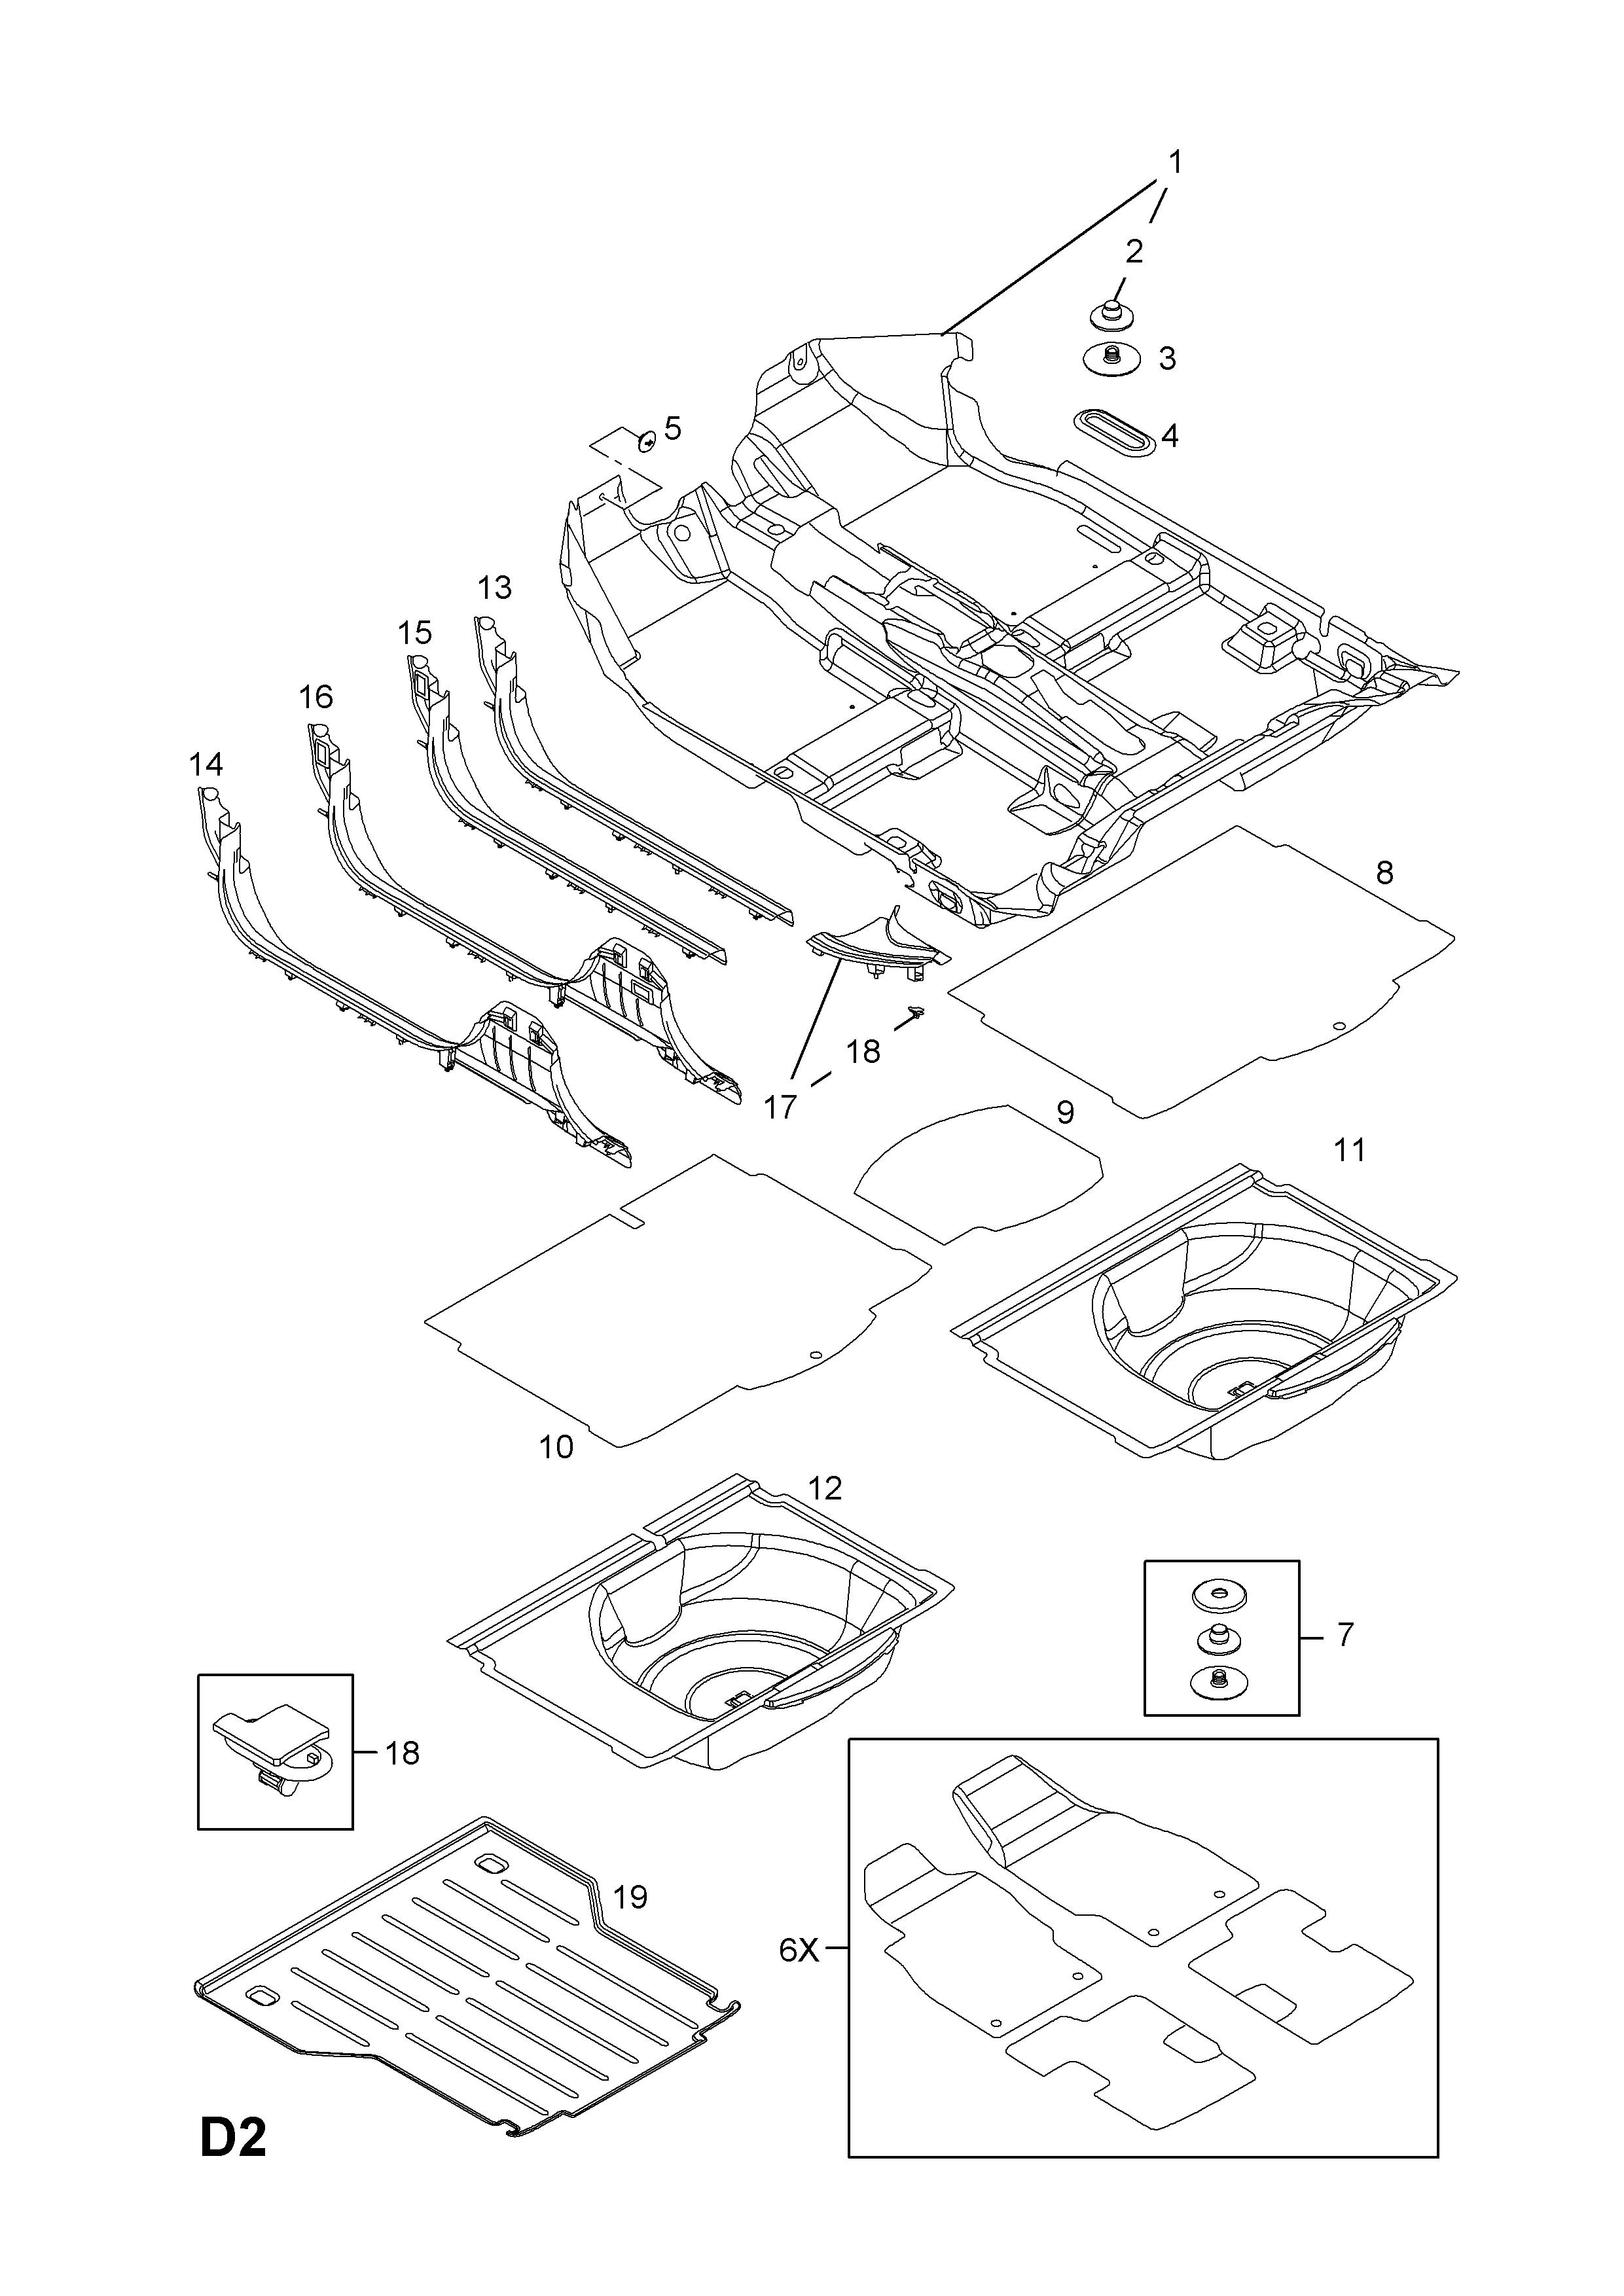 vauxhall bo lpg wiring diagram wiring diagram database 2011 Dodge Ram 1500 Wiring Diagram opel corsa d 2007 d body interior trim 2 floor mats and 2016 vauxhall bo vauxhall bo lpg wiring diagram